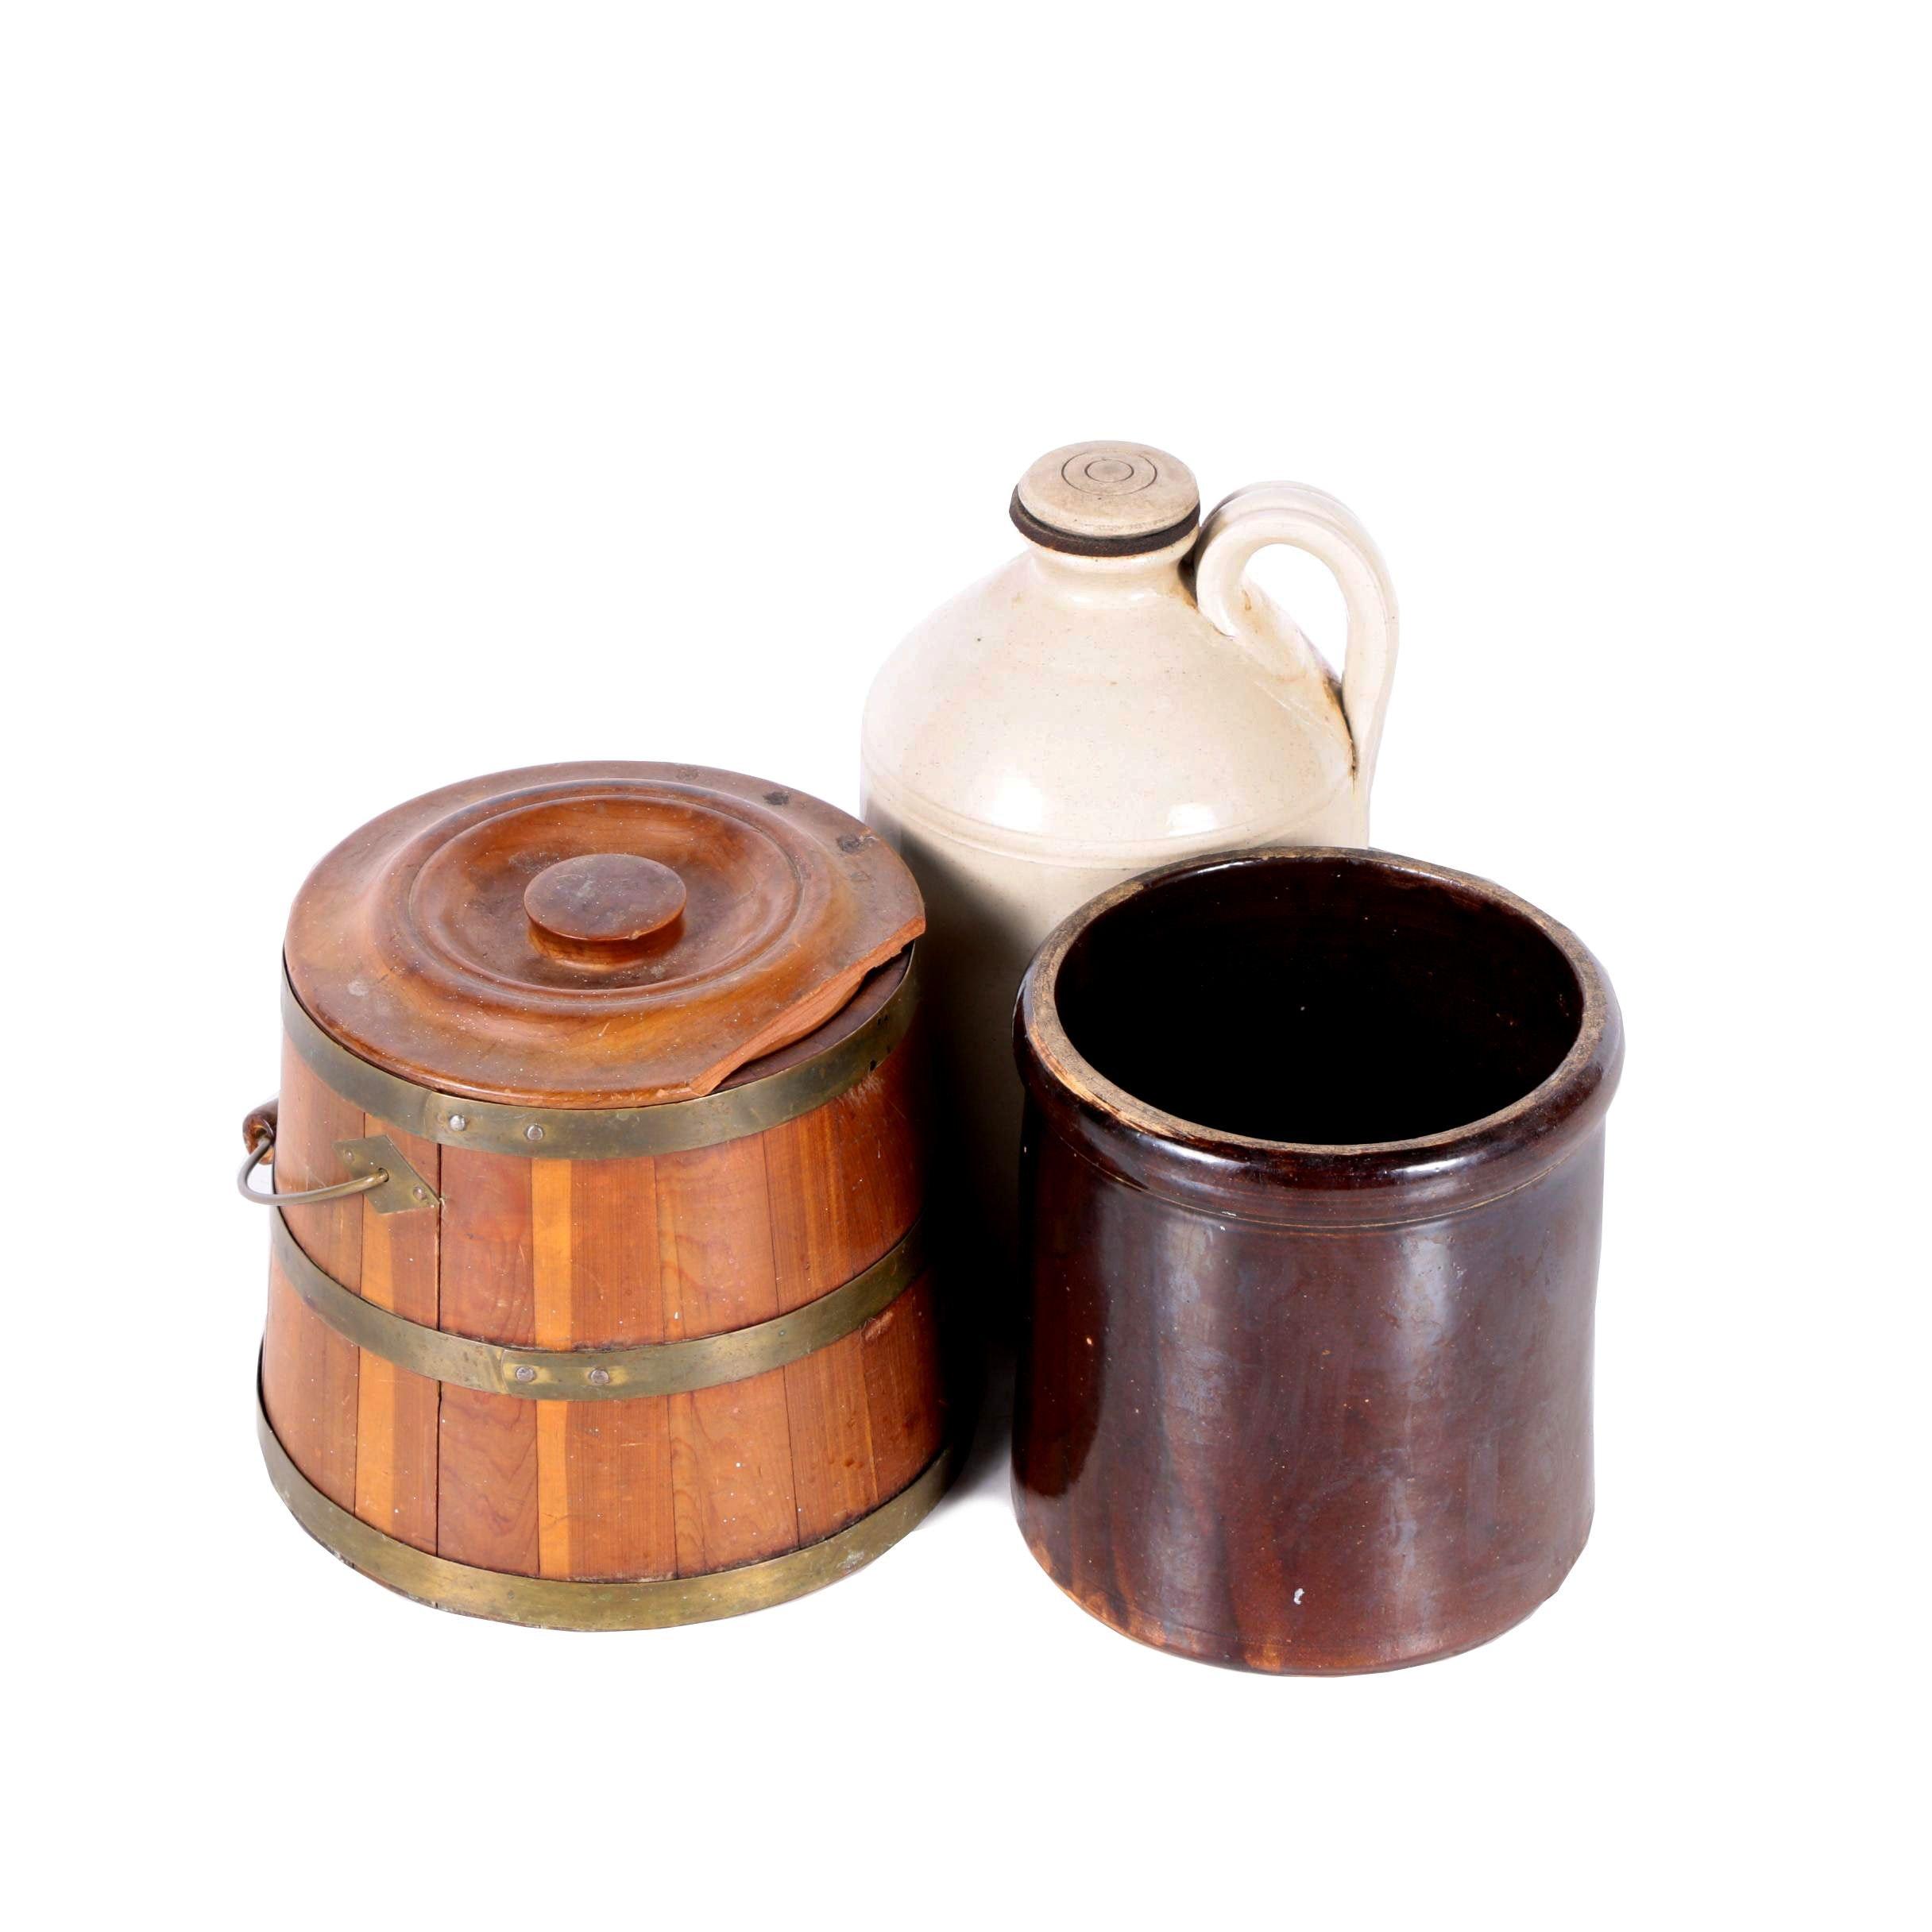 Vintage Stoneware and Wooden Bucket